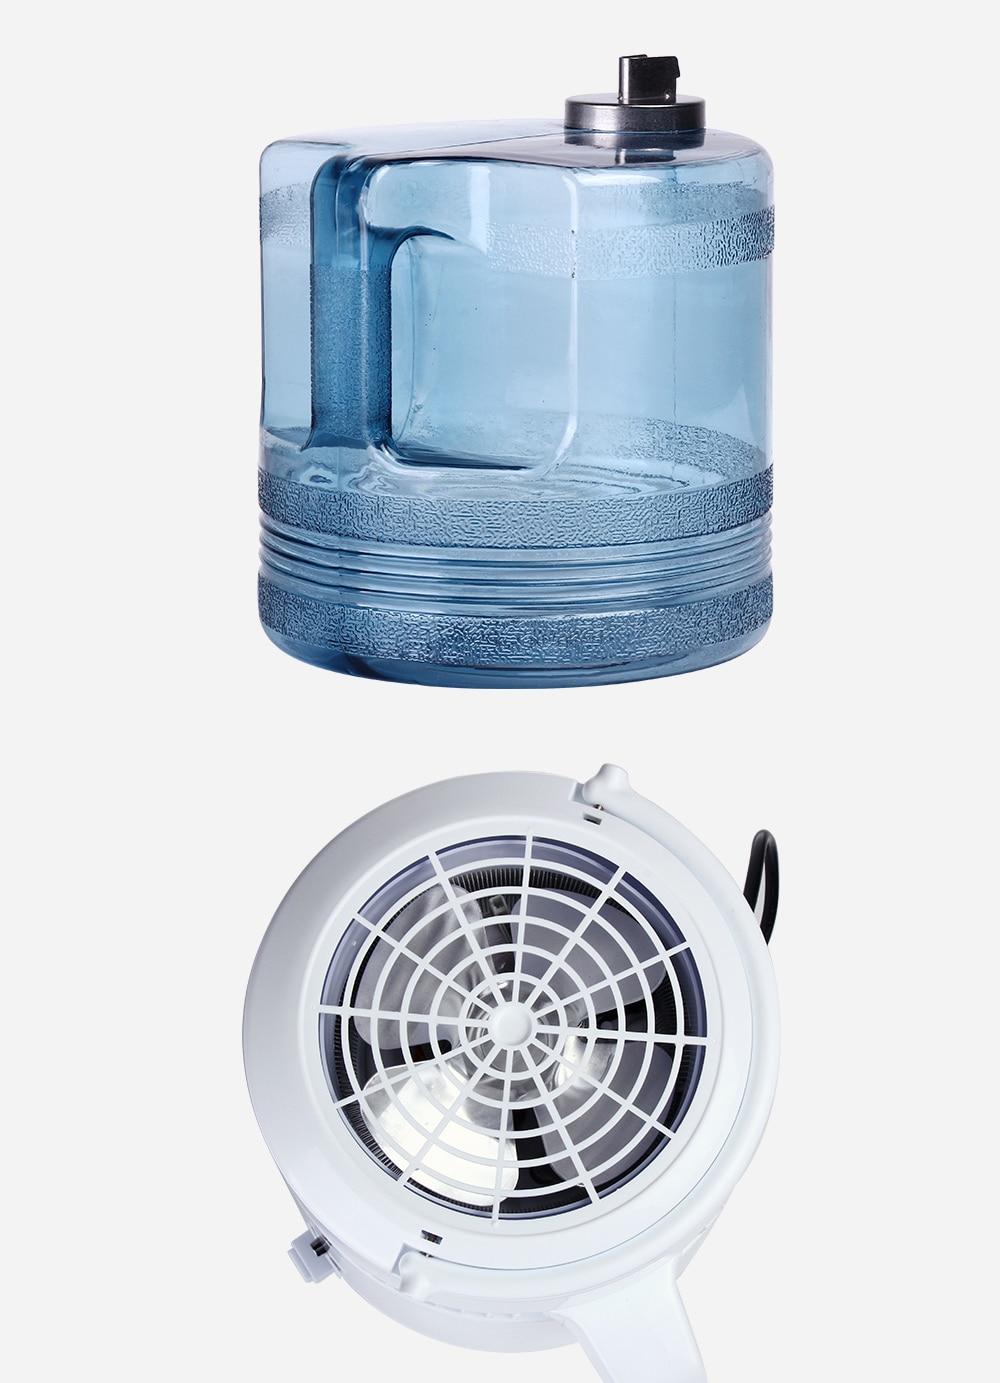 Housing Use 4L Water Distiller Distilled Water Machine Distillation Purifier Stainless Steel Water Filter Russian Instructions